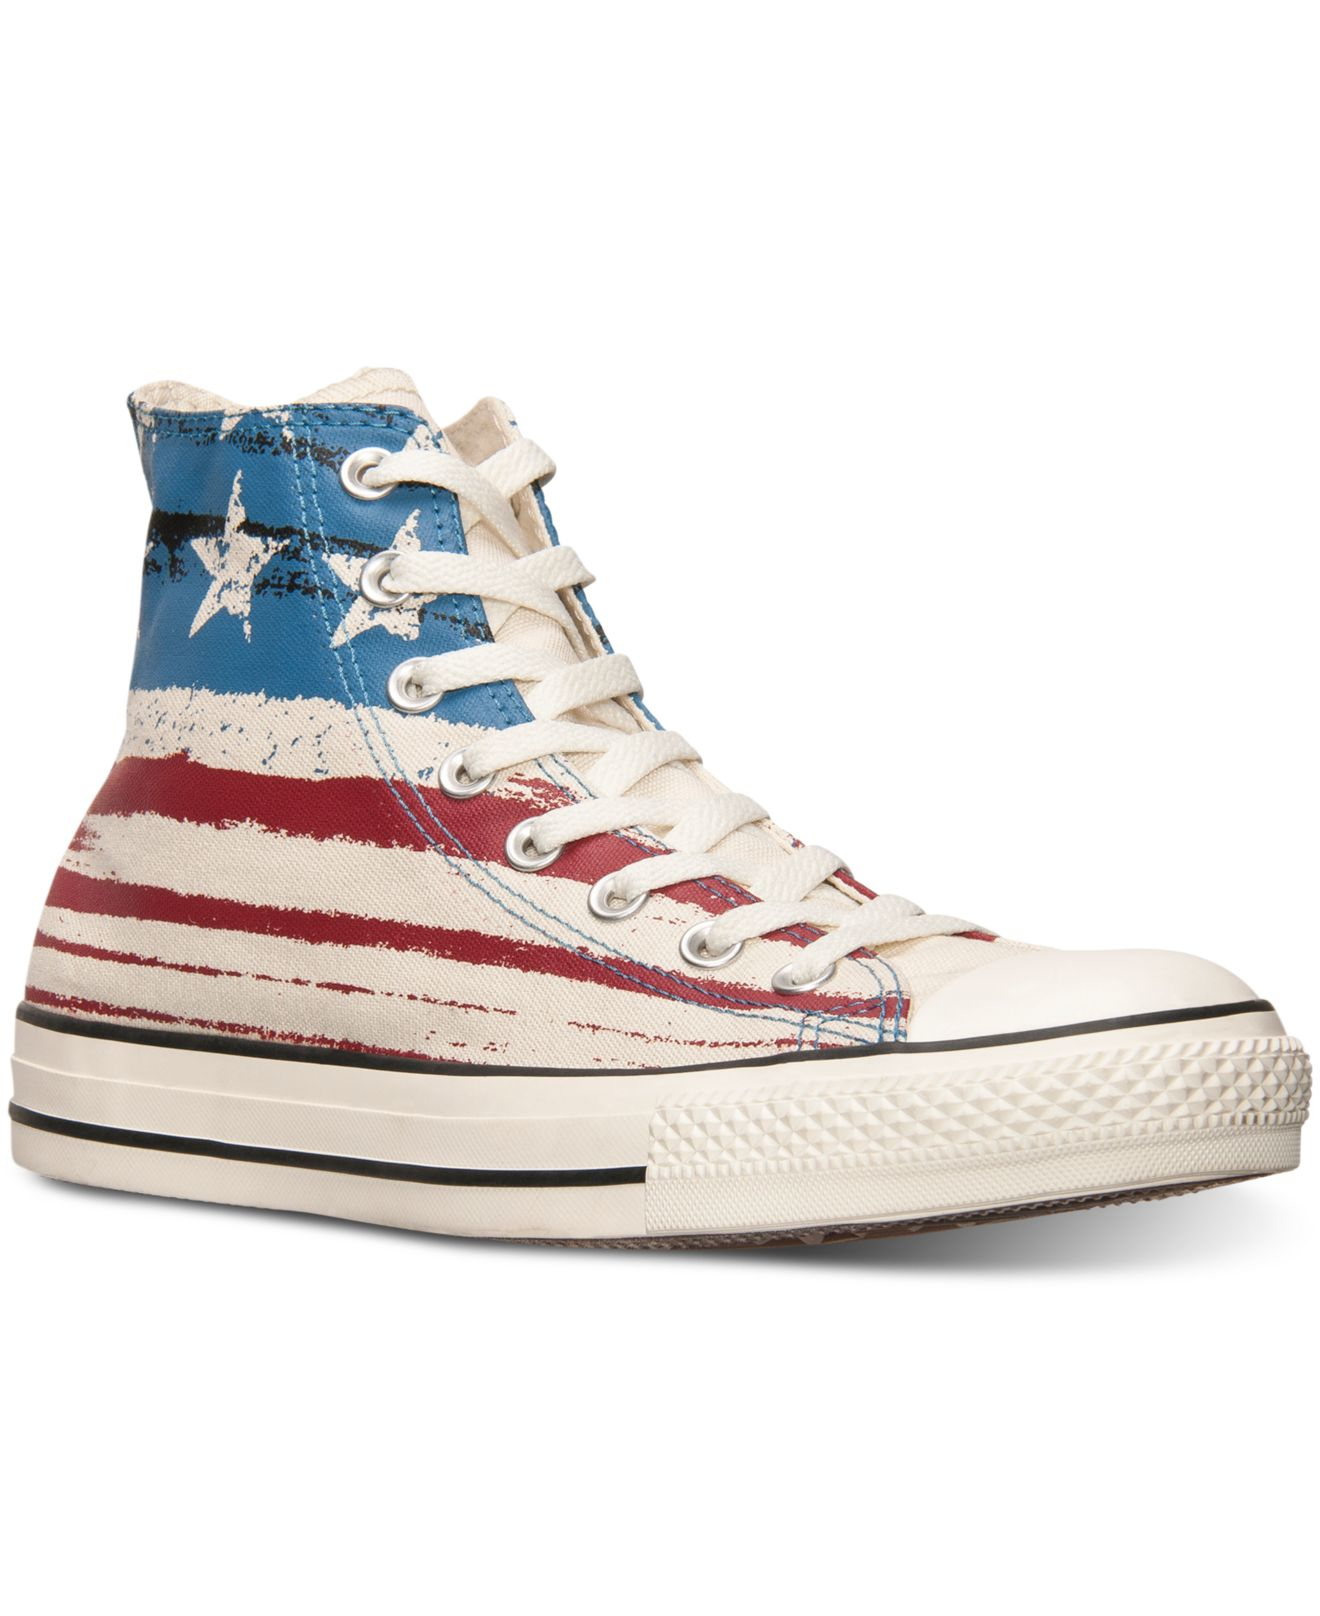 Lyst - Converse Men s Chuck Taylor High Usa Flag Print Casual ... 9db170357